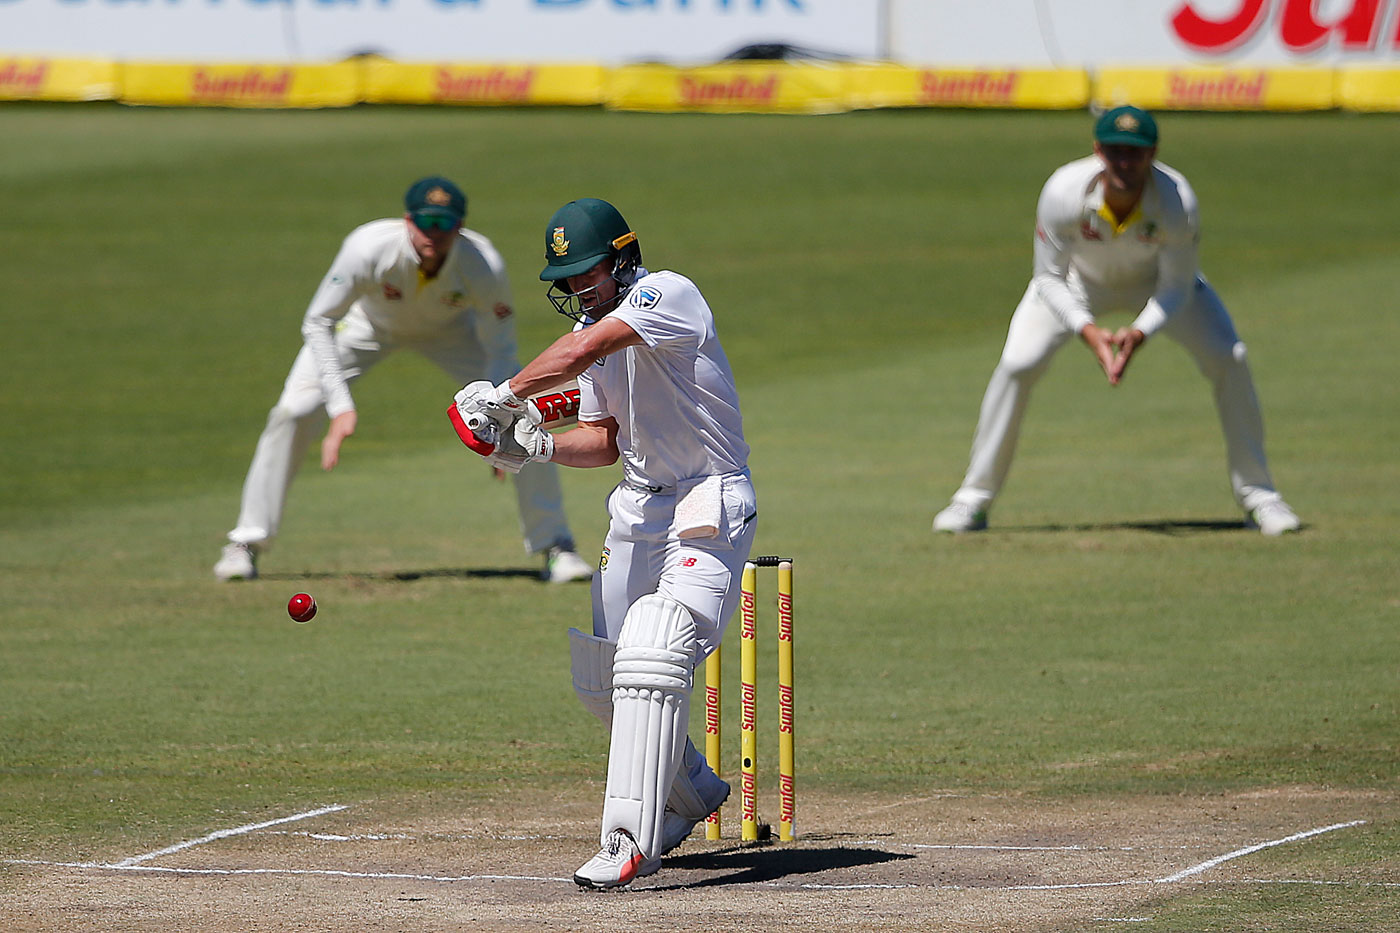 South Africa vs Australia 2nd Test Day 4 Highlight